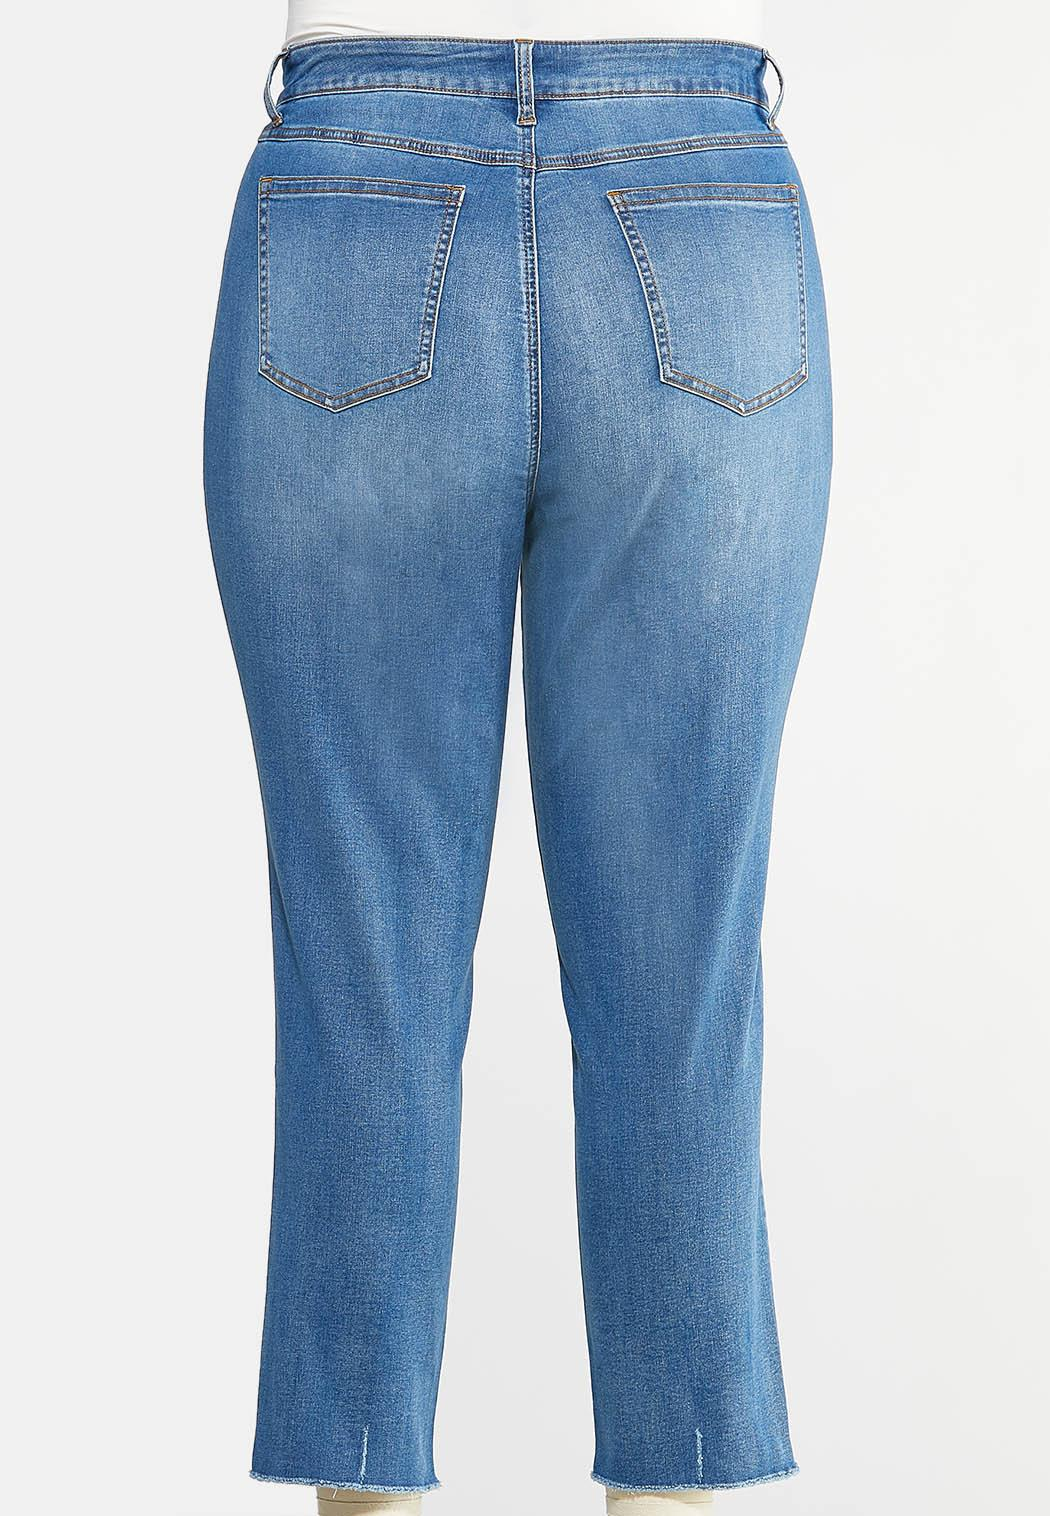 Plus Size Buttonfly Raw Hem Jeans (Item #43966401)